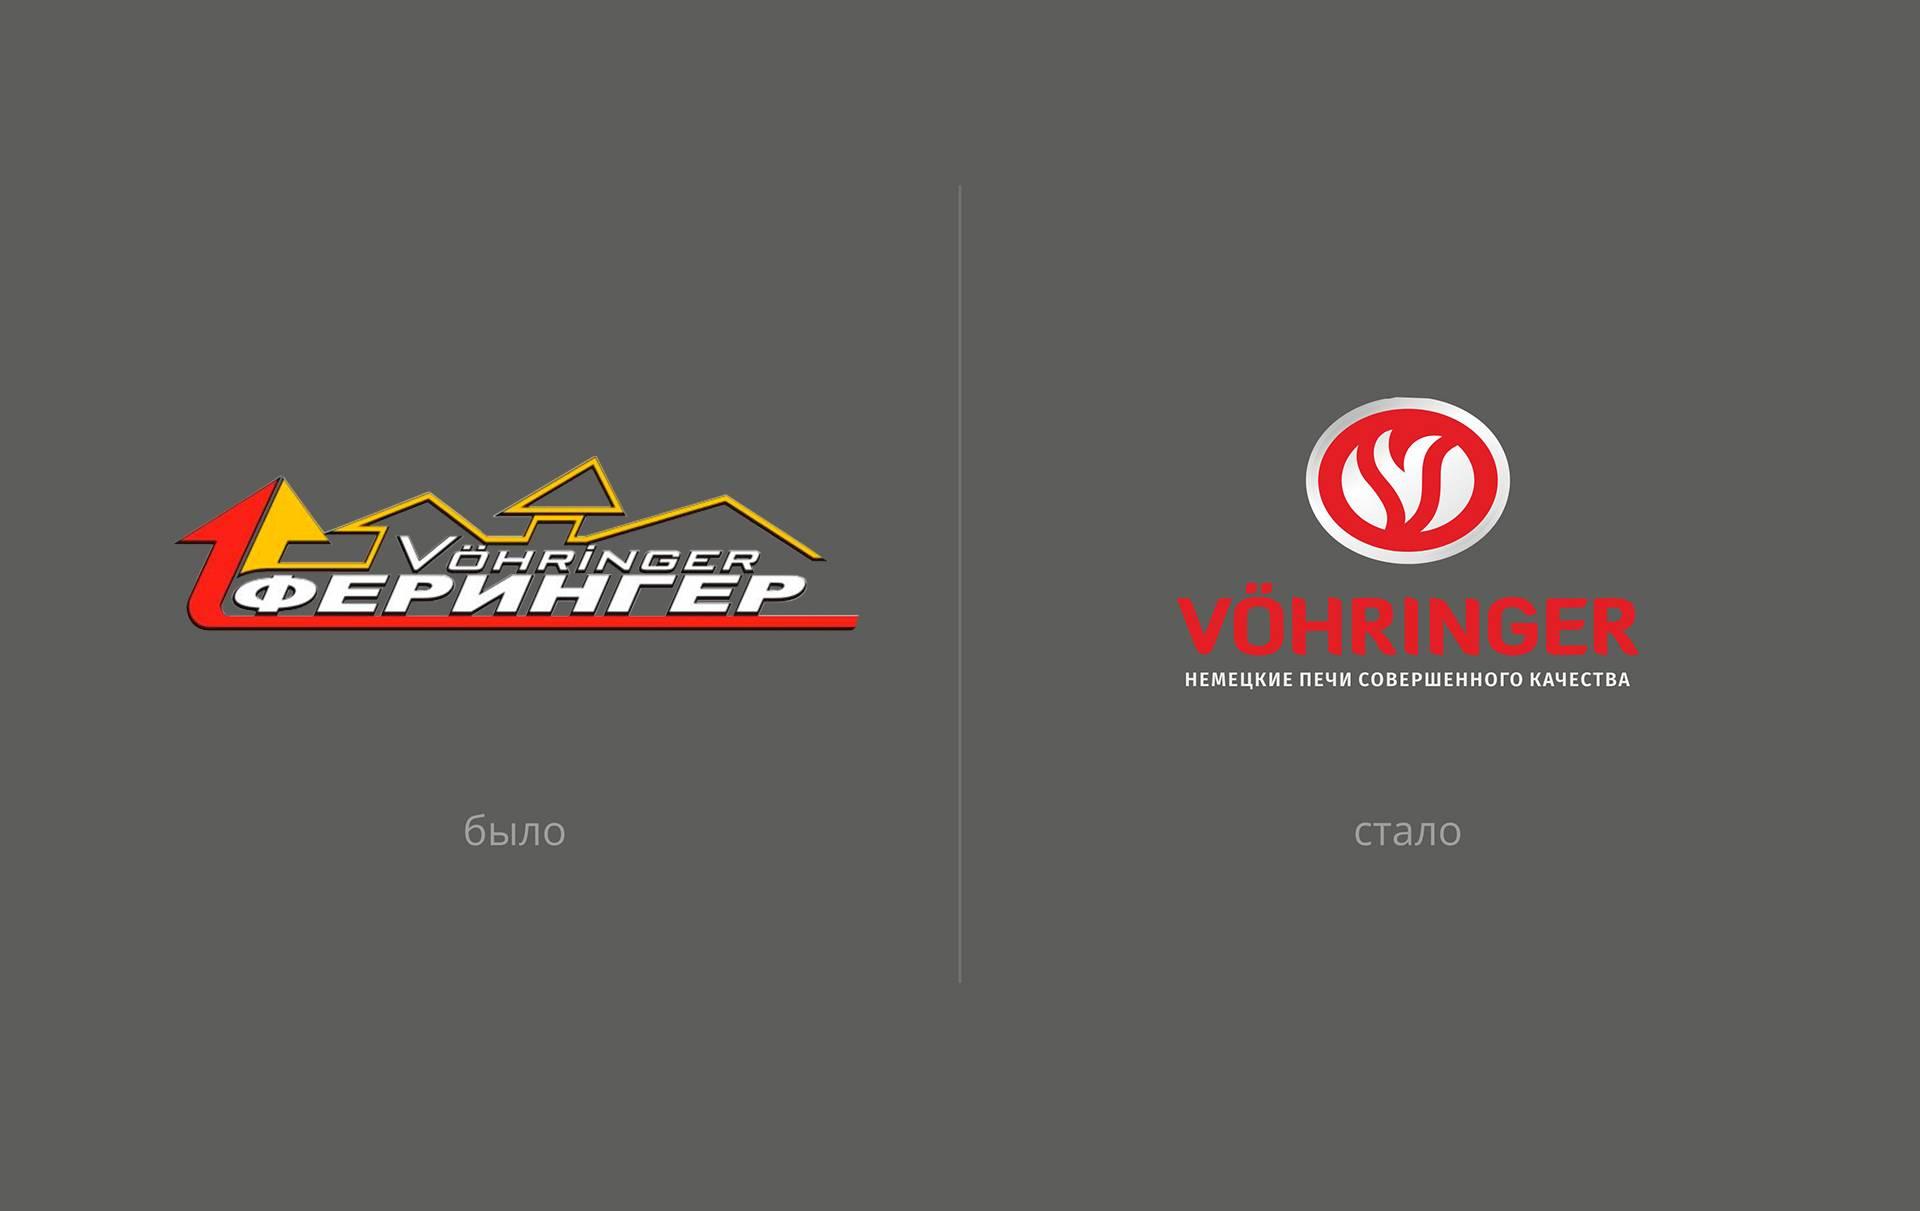 VarioBrands провели комплексную разработку бренда банных печей Vöhringer